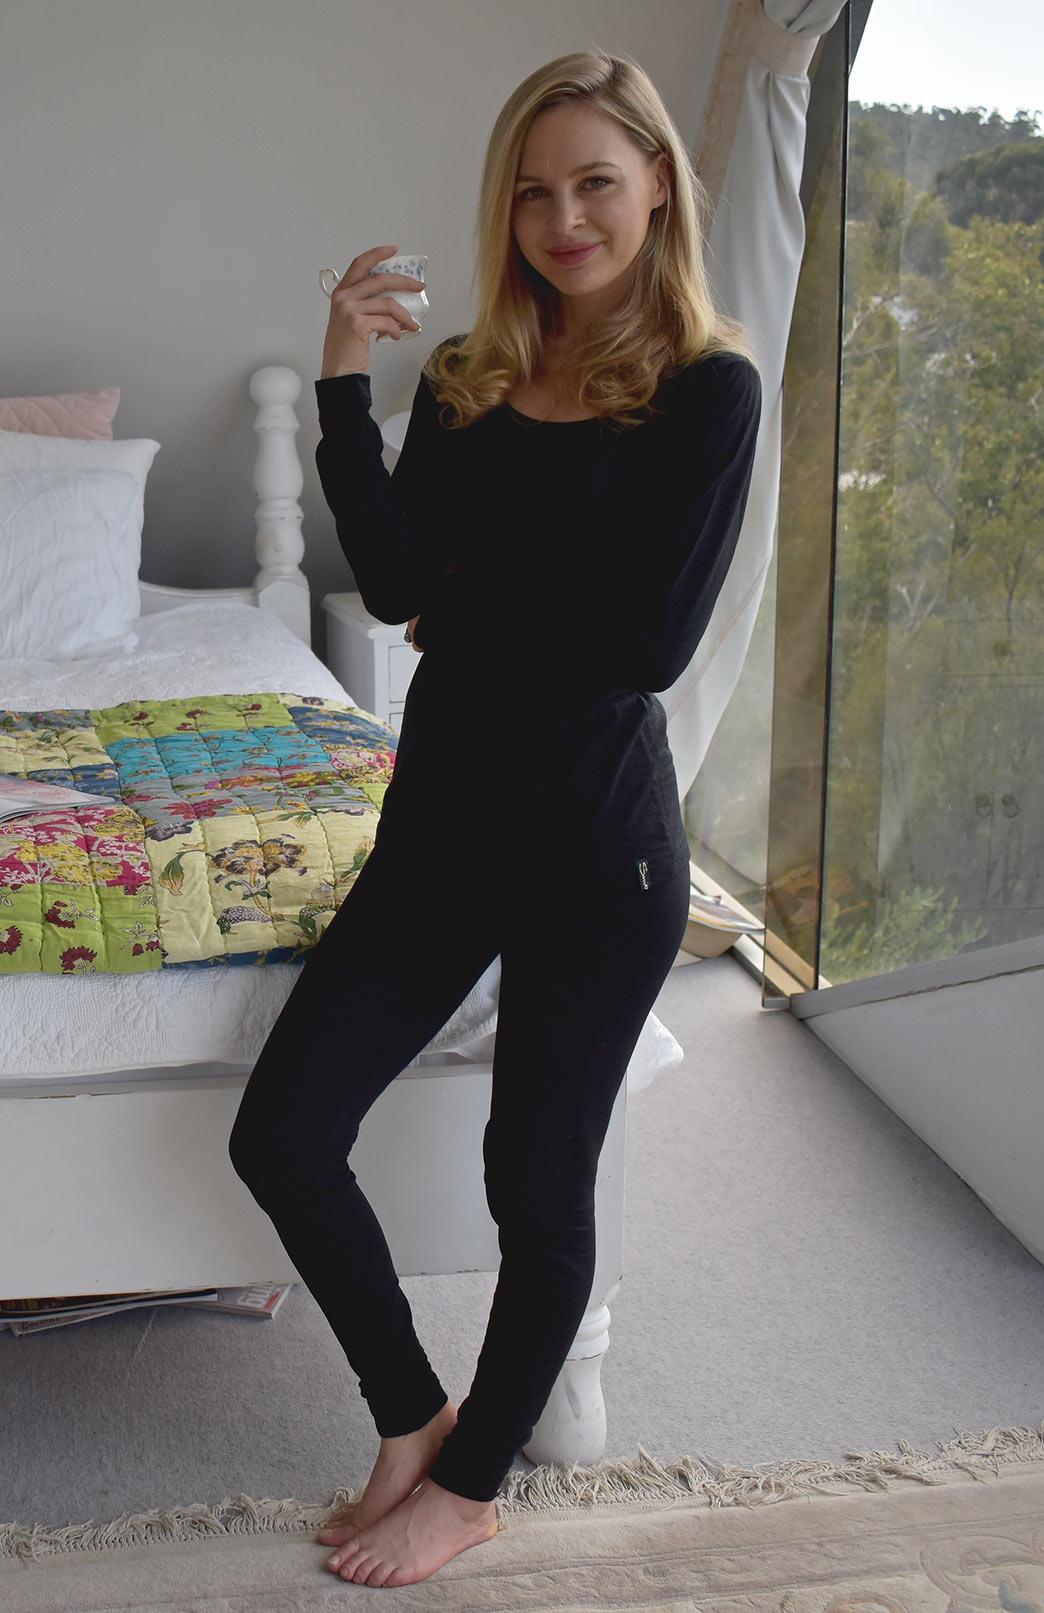 Pyjama Set - Women's Black Merino Wool Matching Pyjama Set of Long Sleeved Scoop Top and Tights - Smitten Merino Tasmania Australia